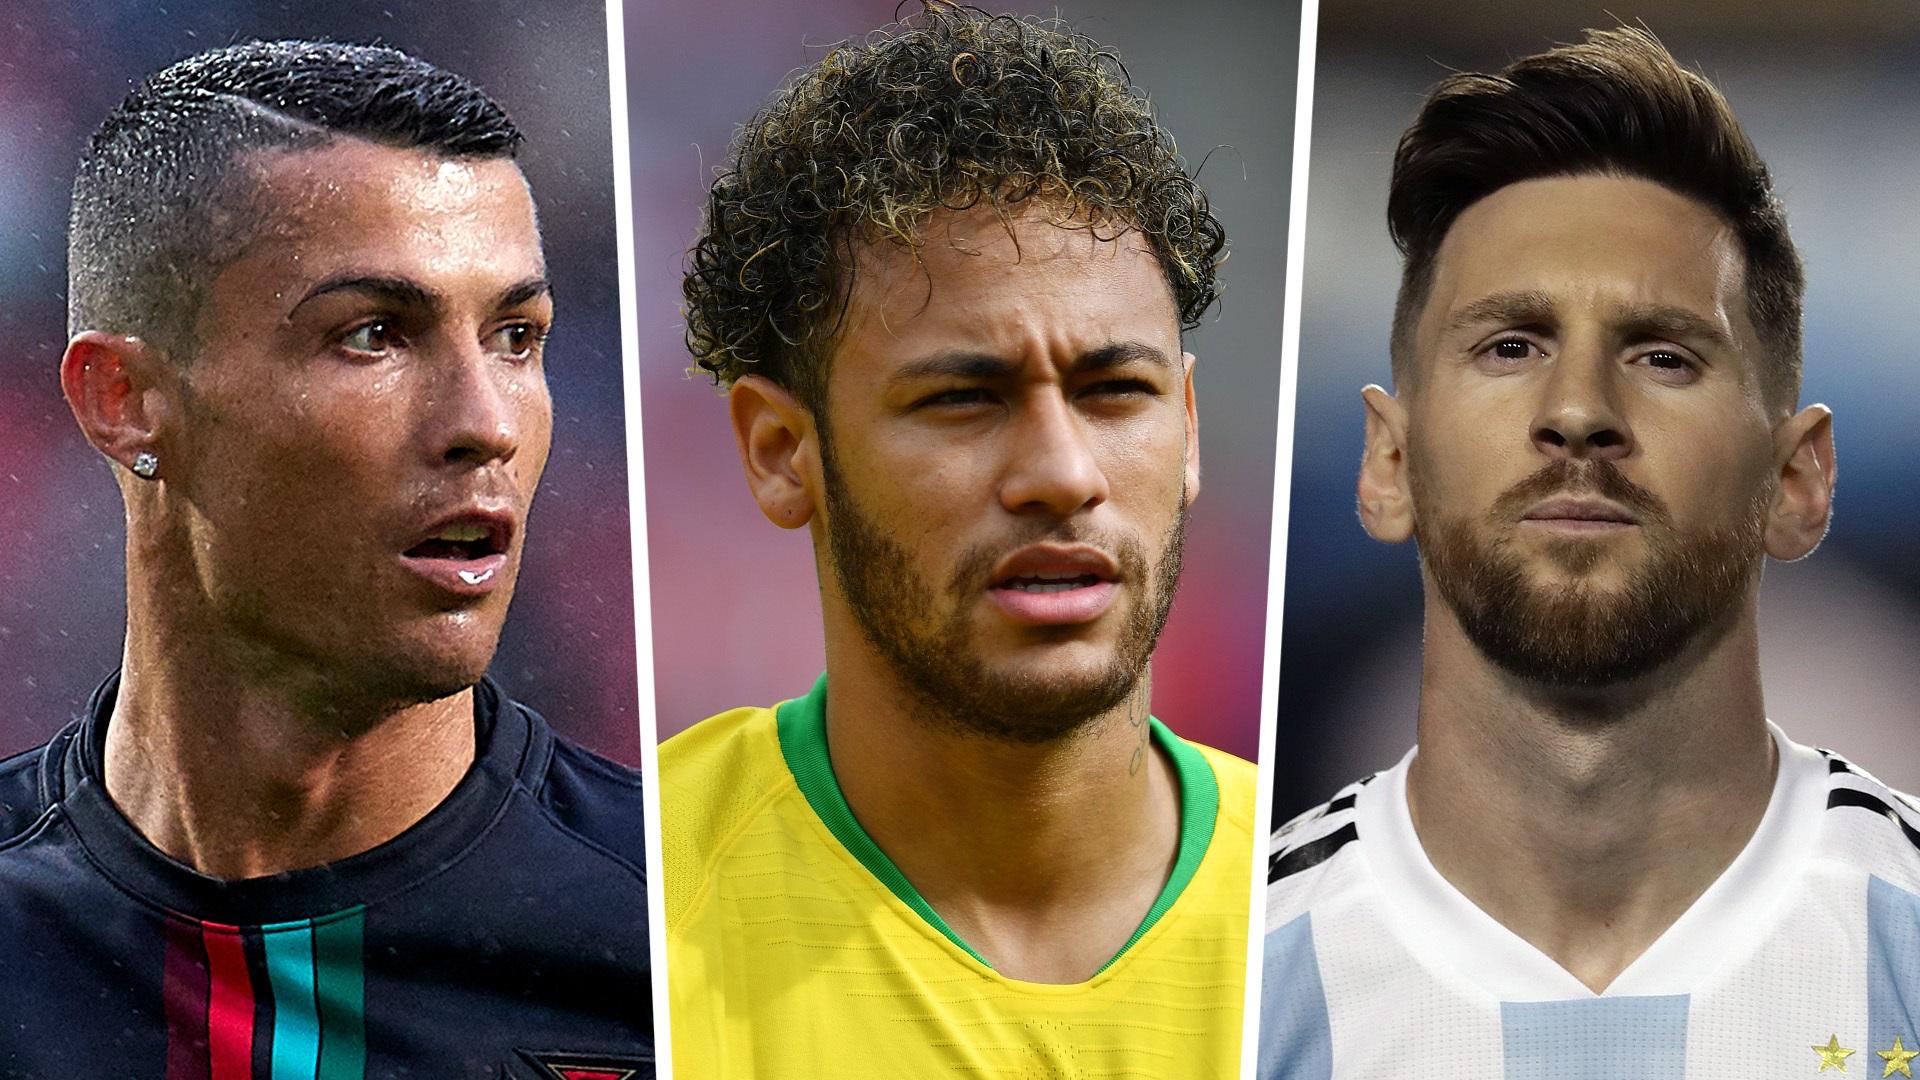 'Neymar above Messi & Ronaldo as best in the world' – PSG's Brazilian superstar gets big billing from Ribeiro